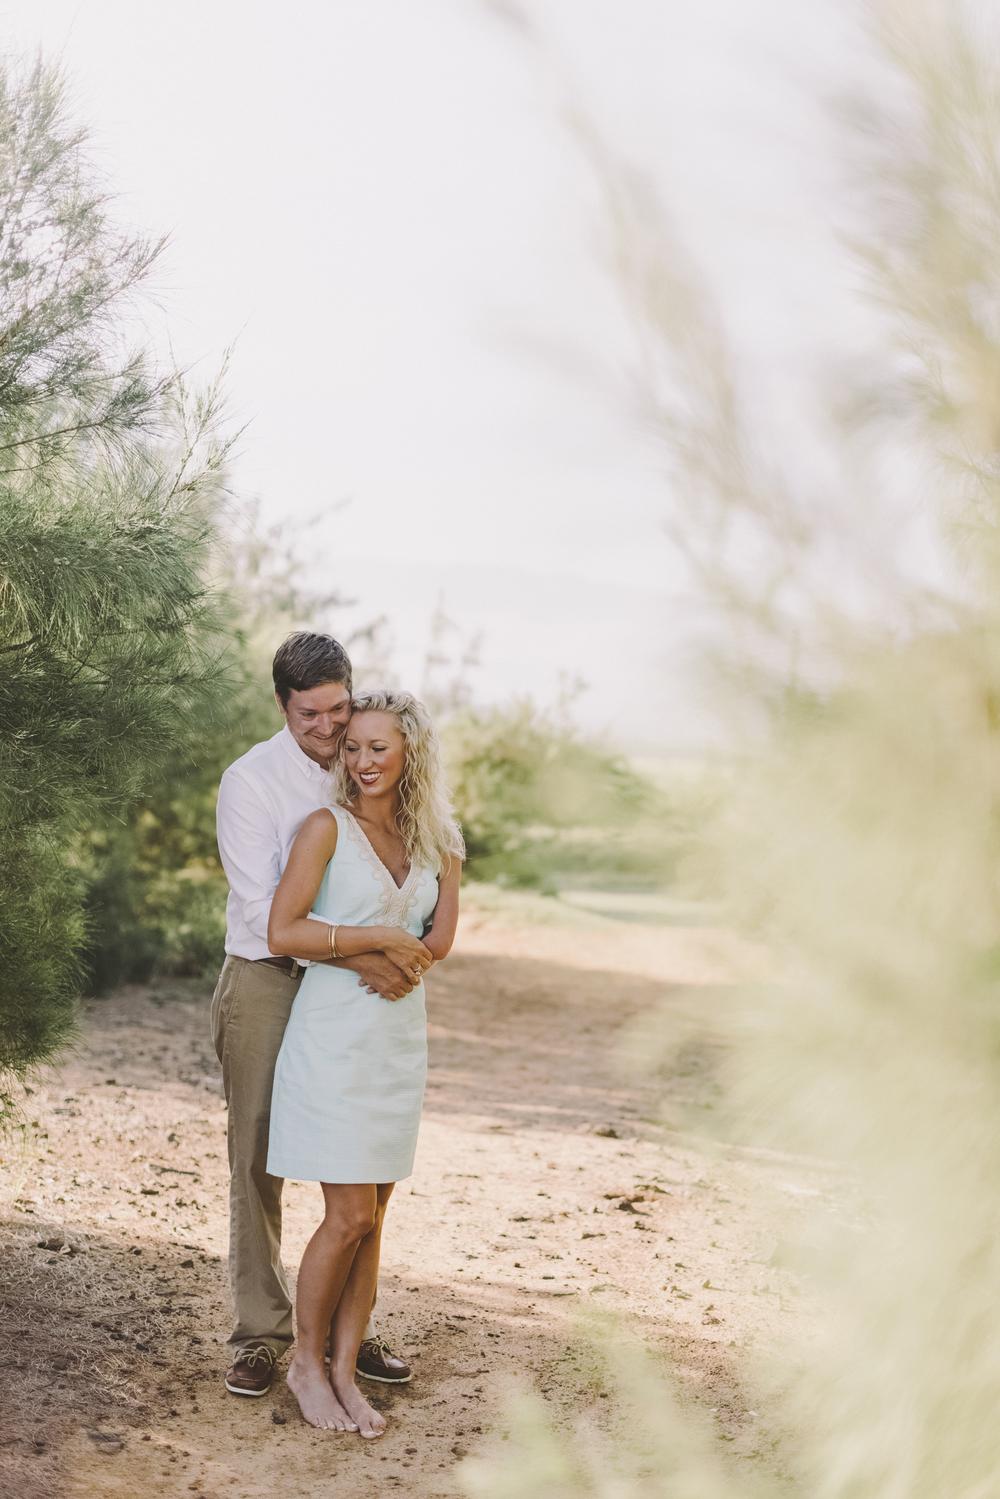 angie-diaz-photography-maui-honeymoon-6.jpg